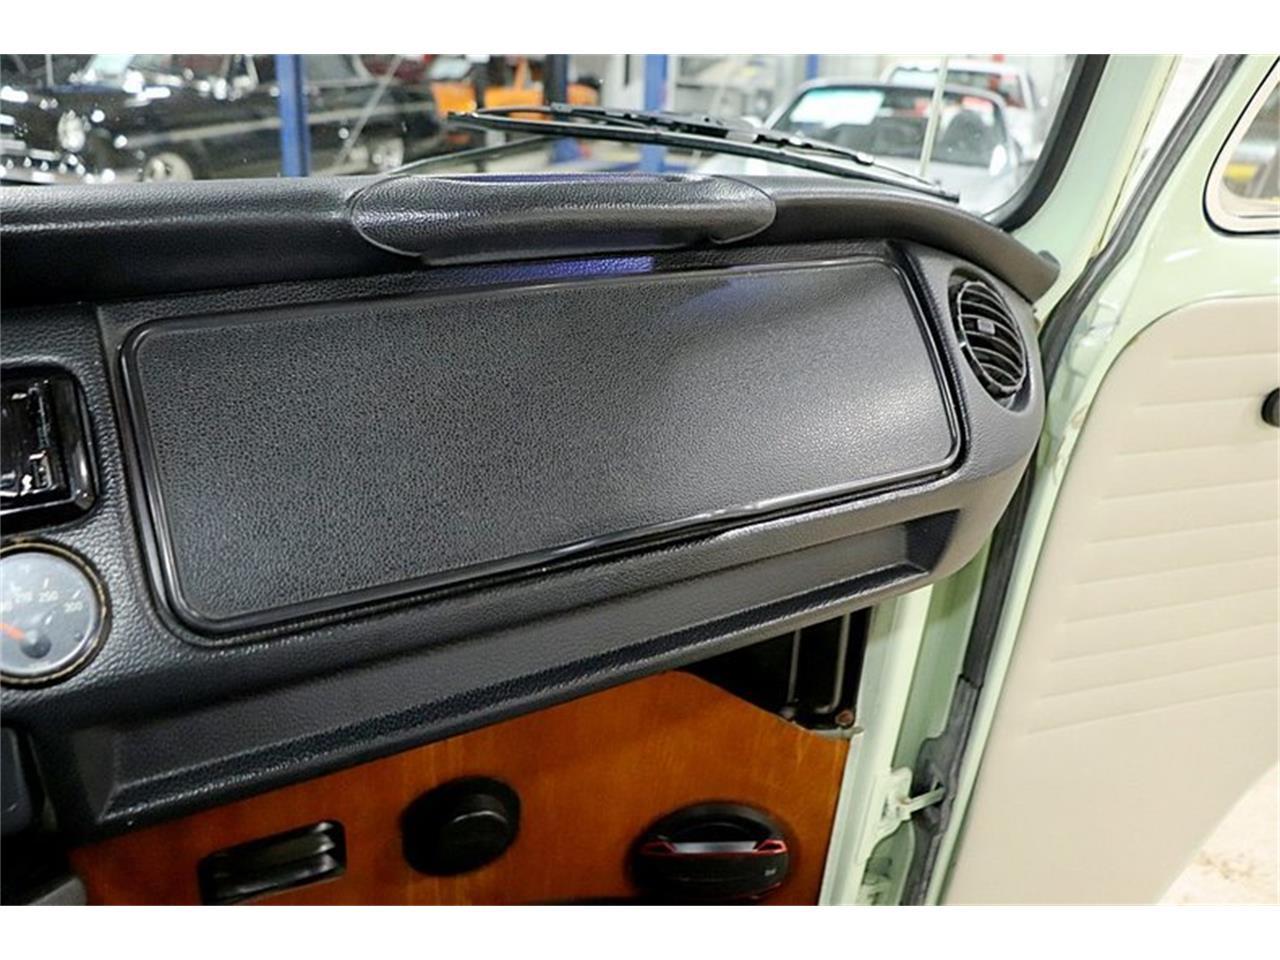 Large Picture of 1969 Volkswagen Westfalia Camper located in Michigan - Q5WZ